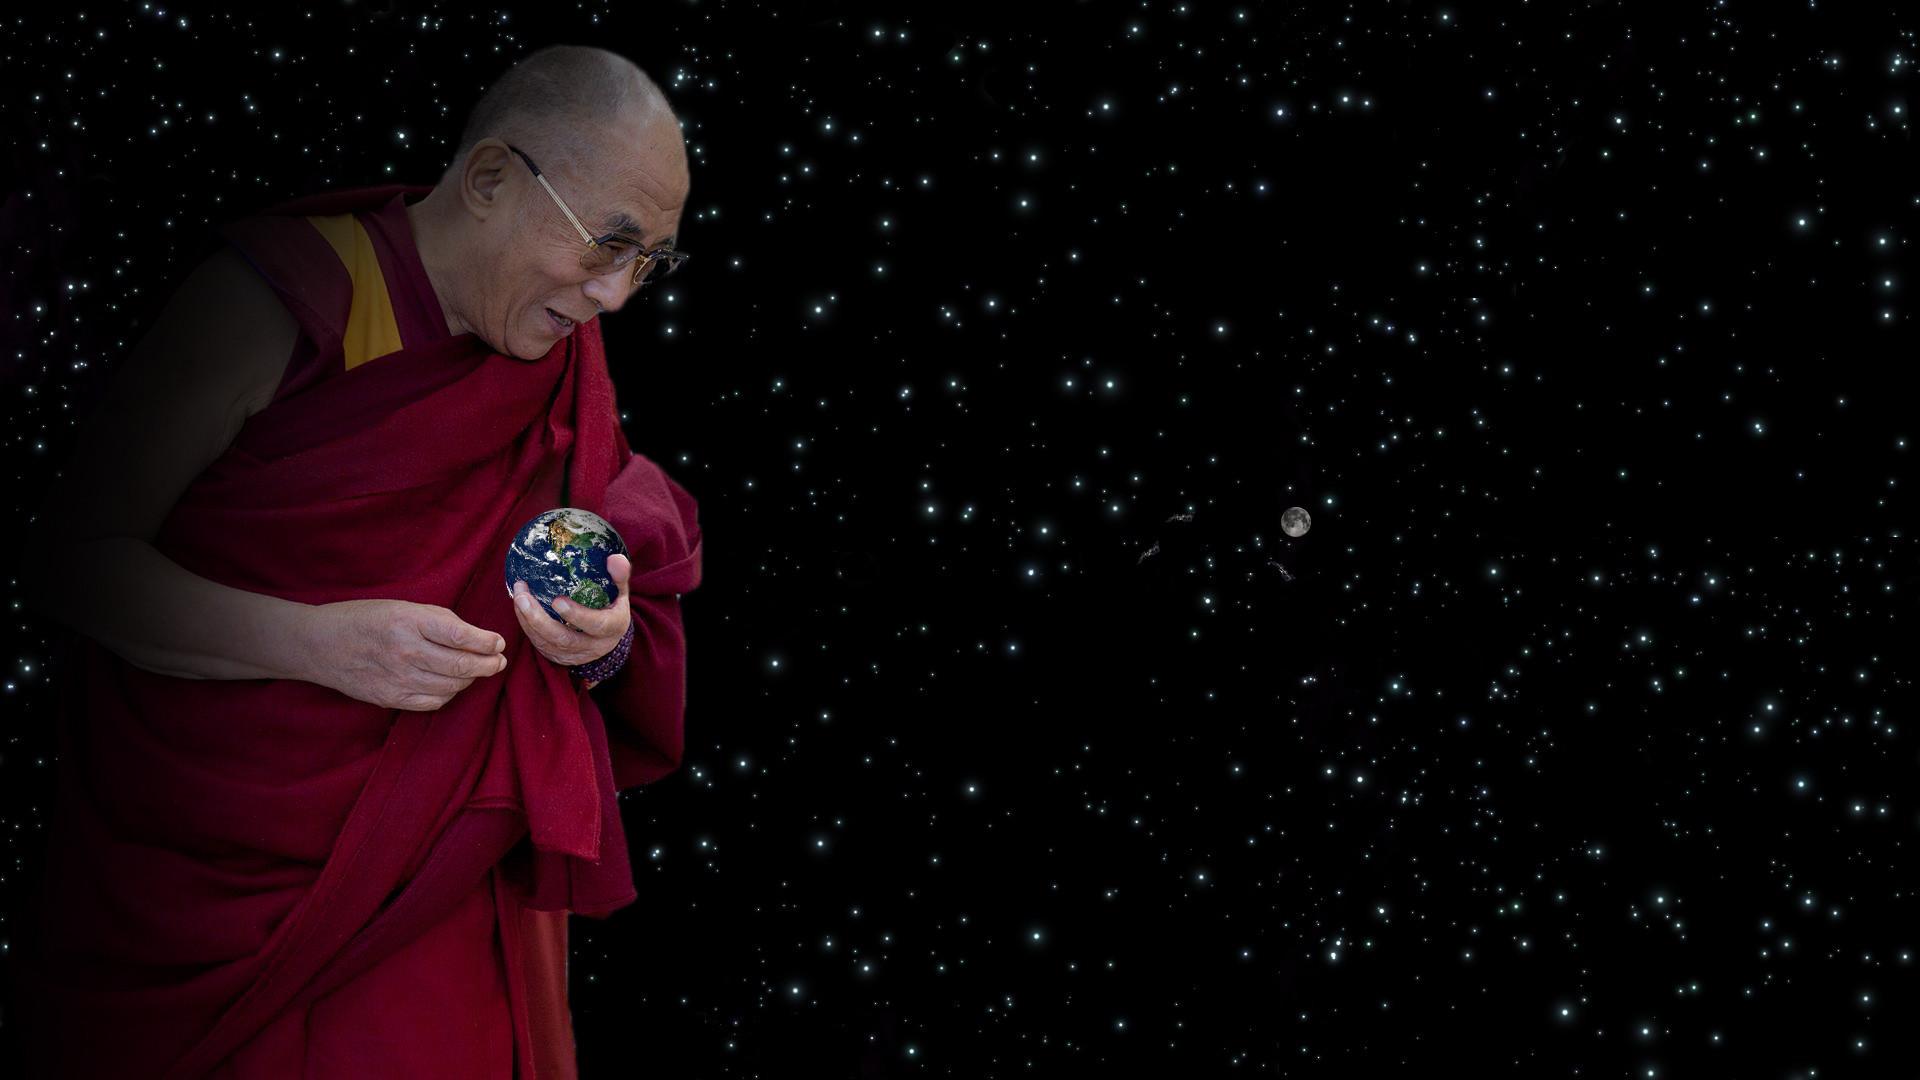 Buddhist Quote Phone Wallpaper Dalai Lama Wallpaper 183 ①